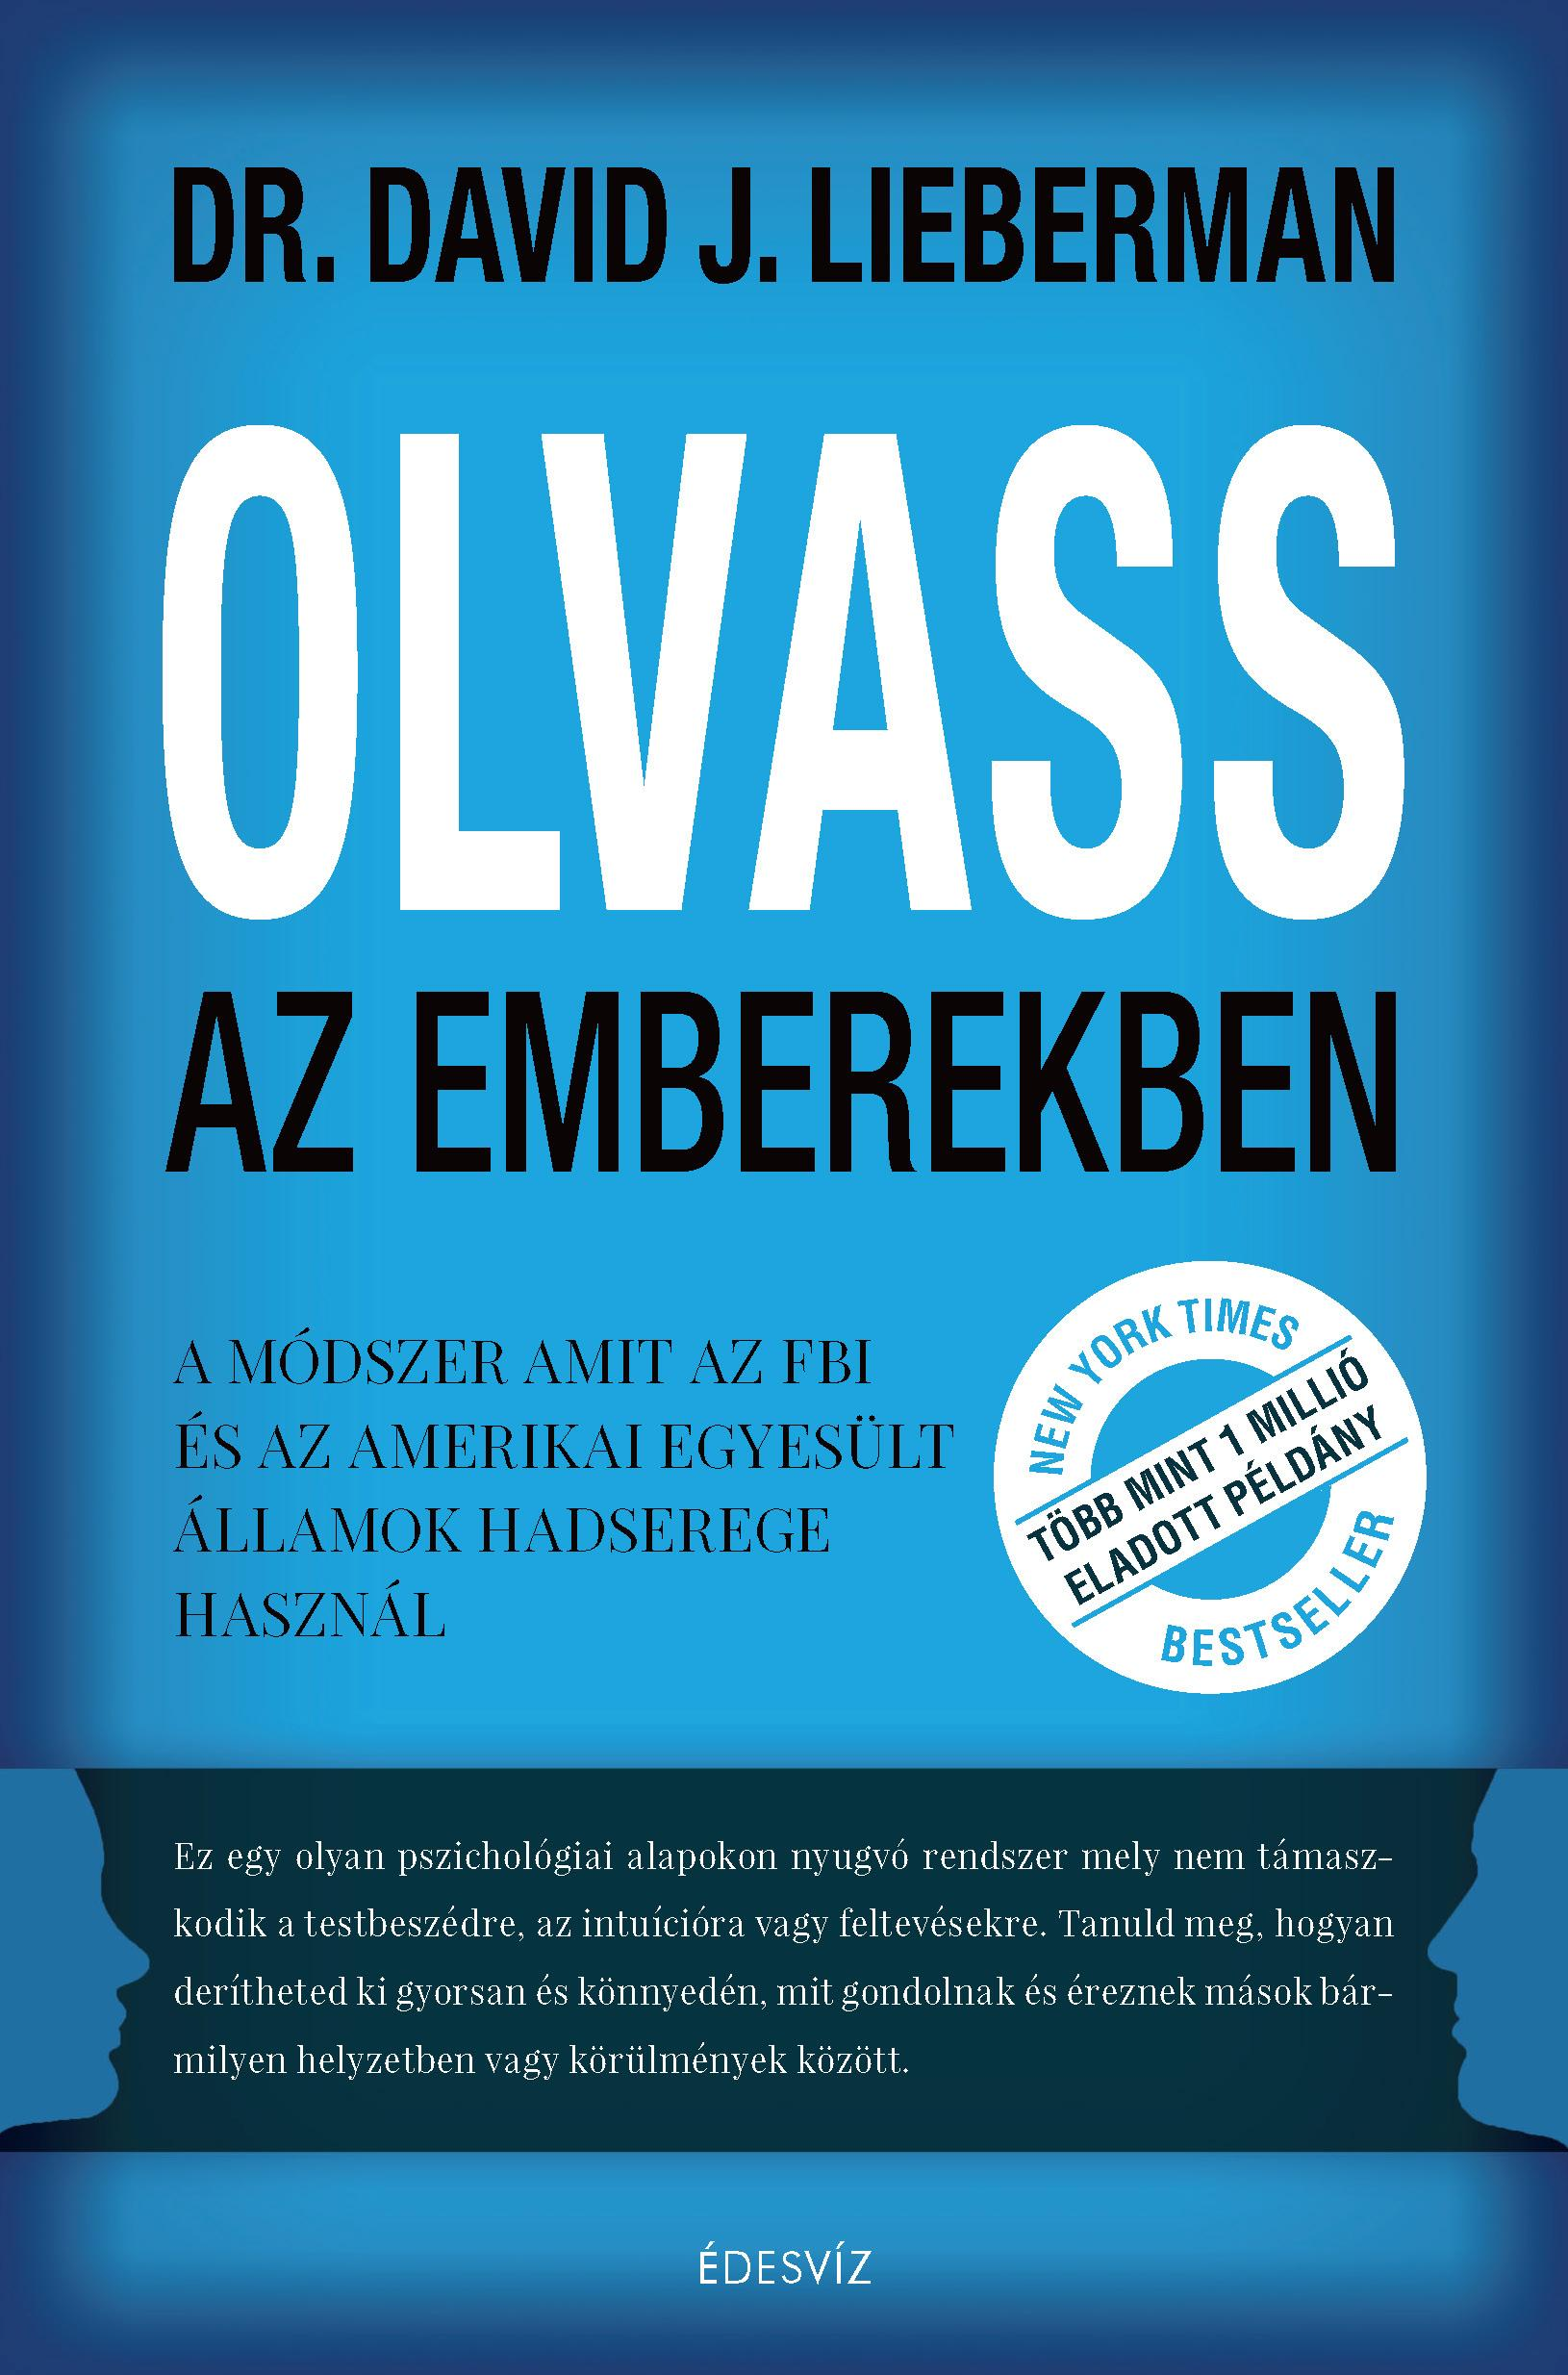 LIEBERMAN, DAVID J. - OLVASS AZ EMBEREKBEN